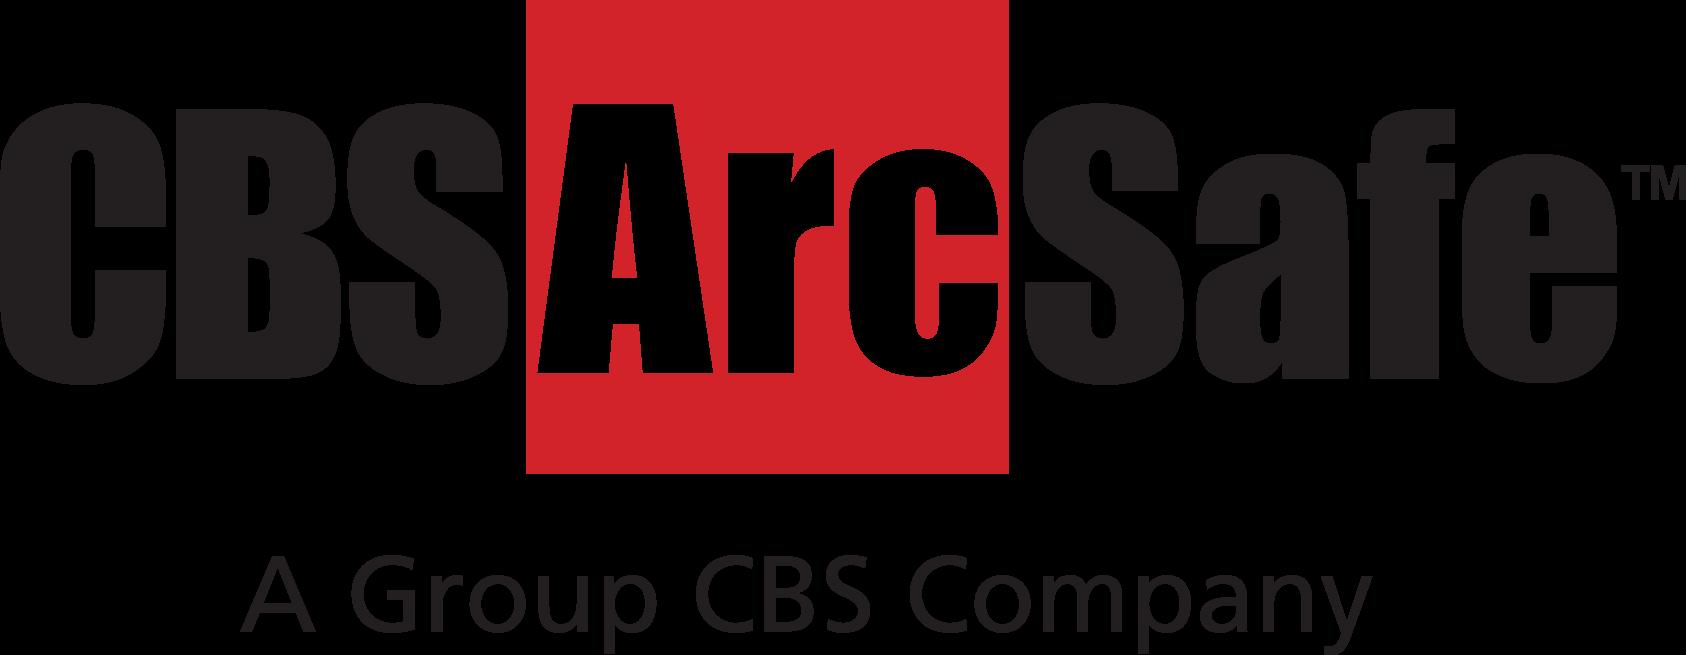 CBS ArcSafe